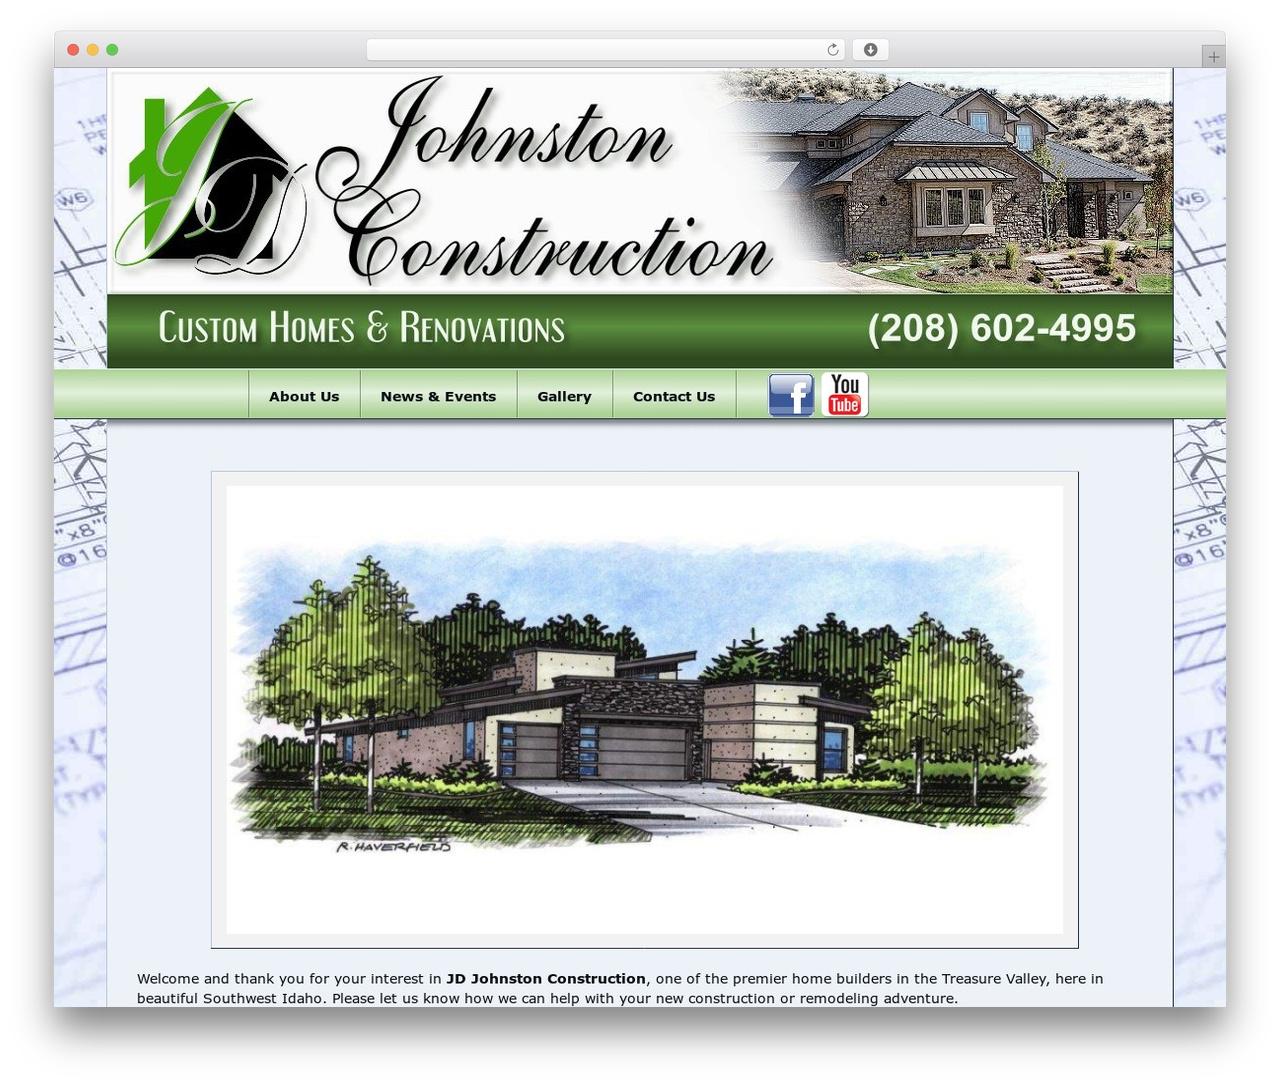 JDJohnston v1.0 WP template - jdjohnstonconstruction.com